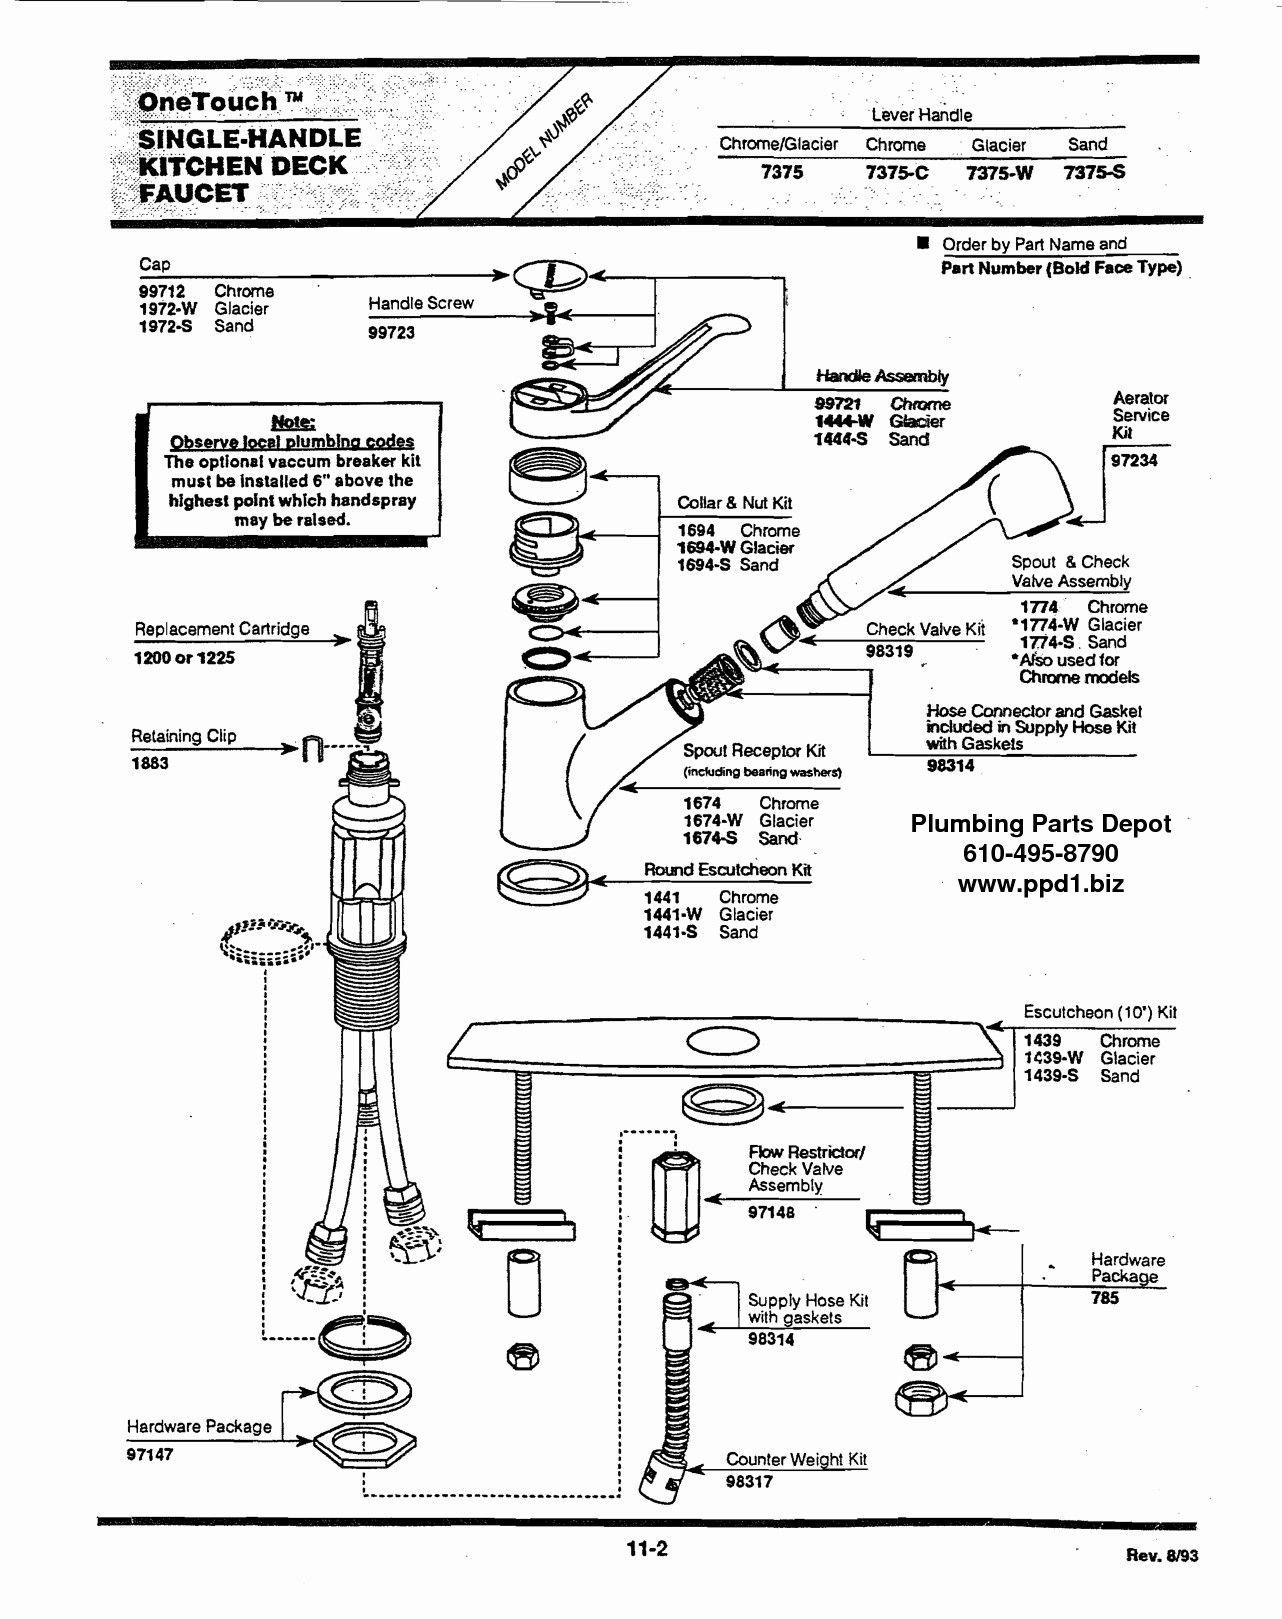 Fresh B and K Faucet Parts | Faucet